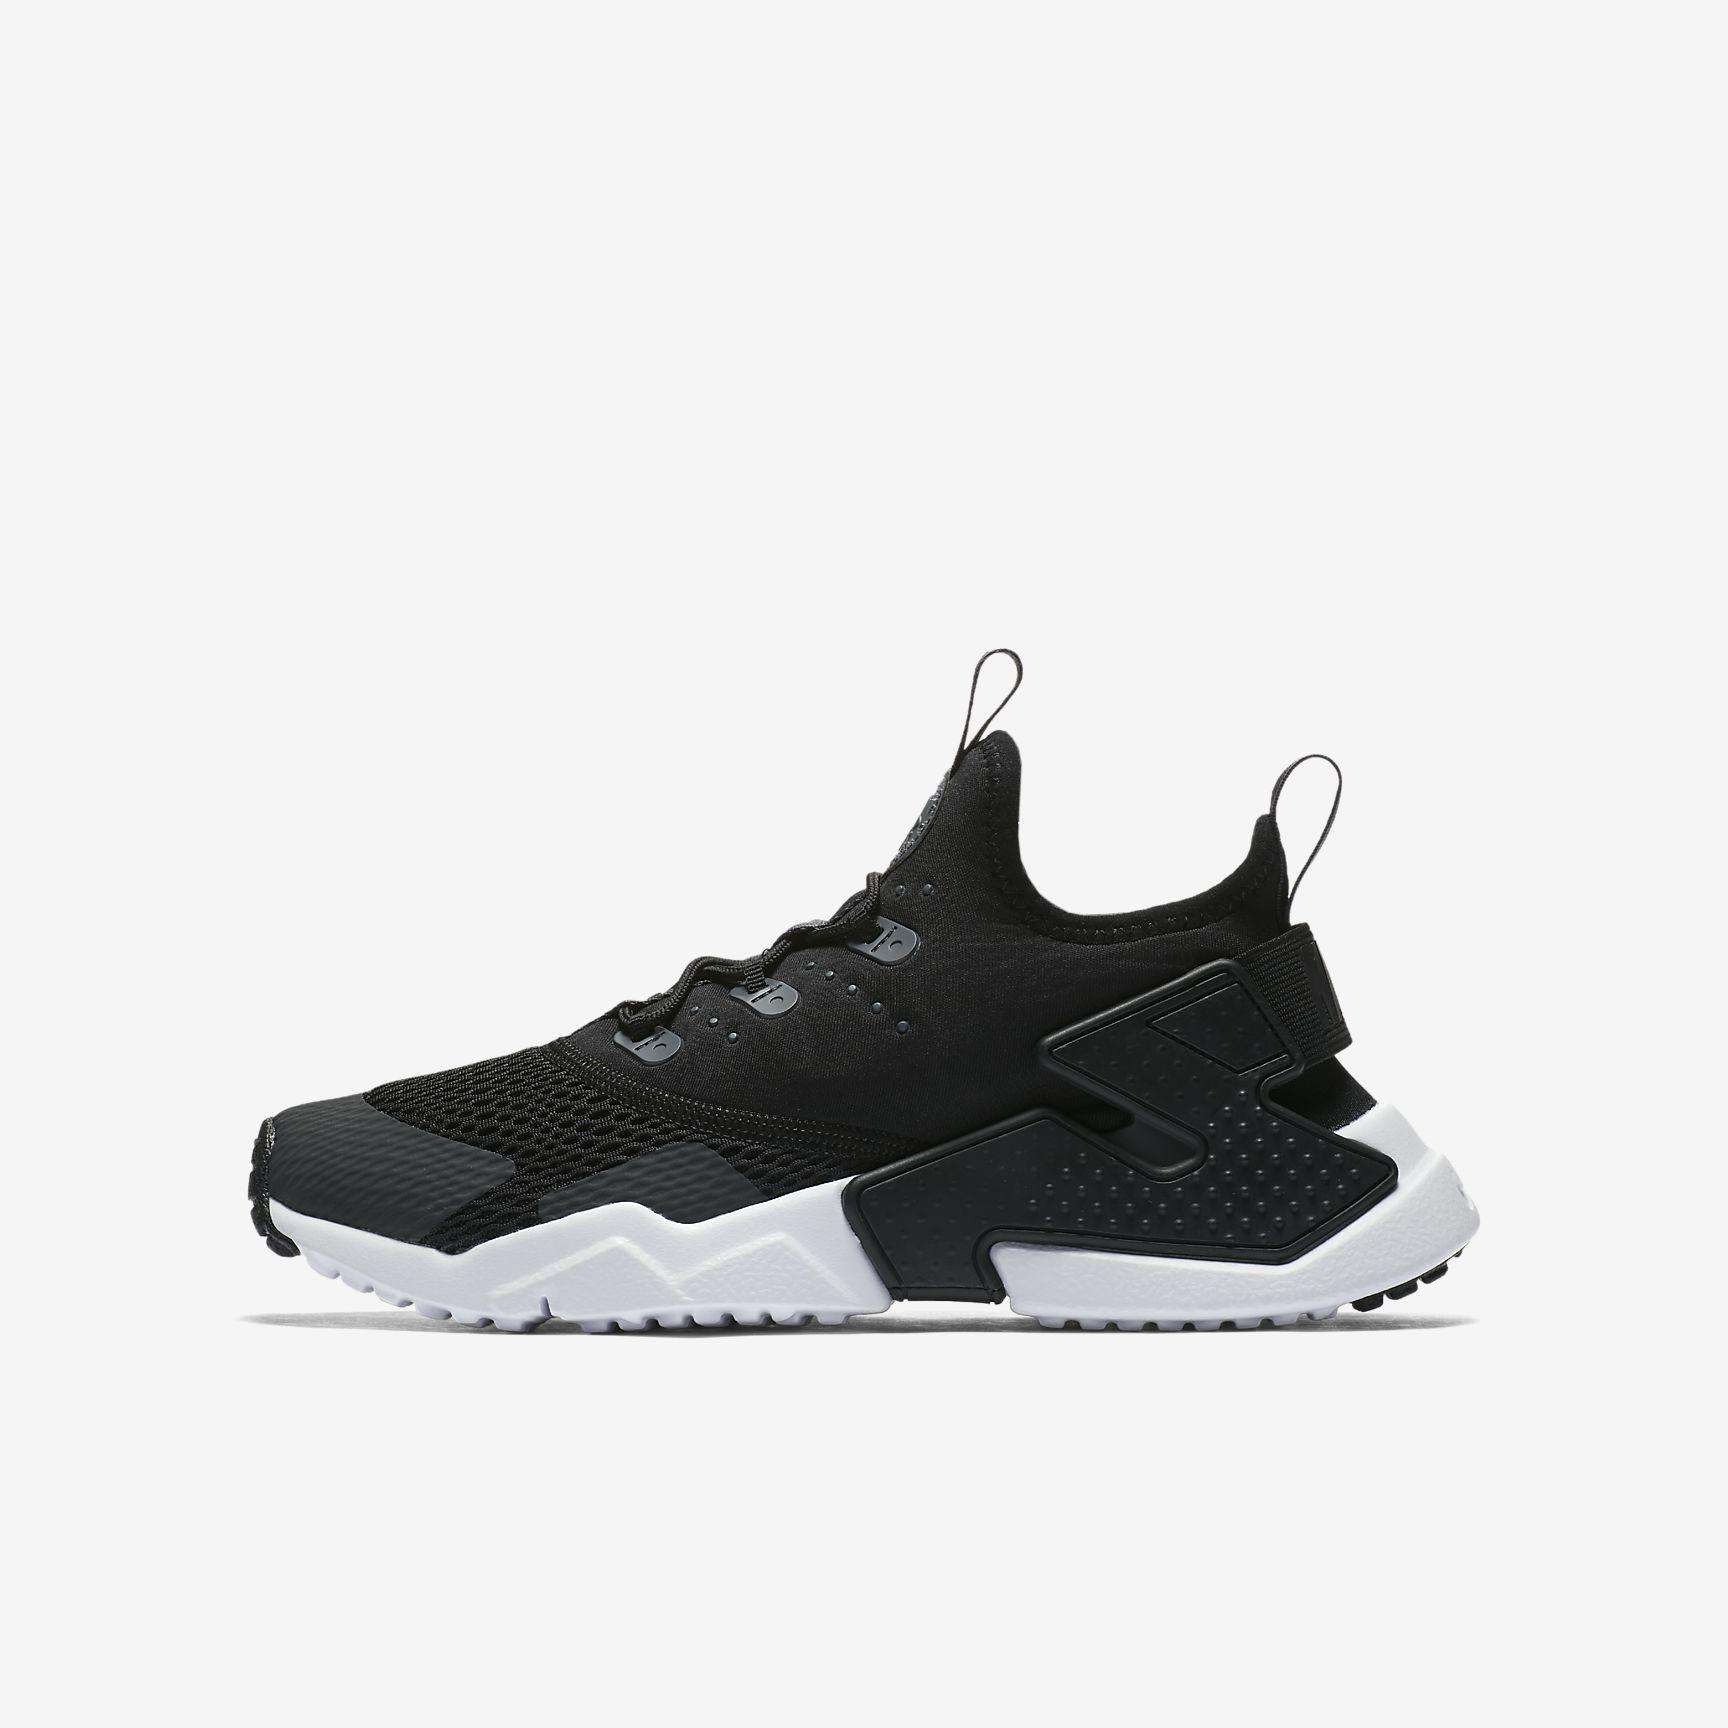 quality design 04383 a91df Chaussures Homme AIR HUARACHE Drift Noir Anthracite Blanc Anthracite